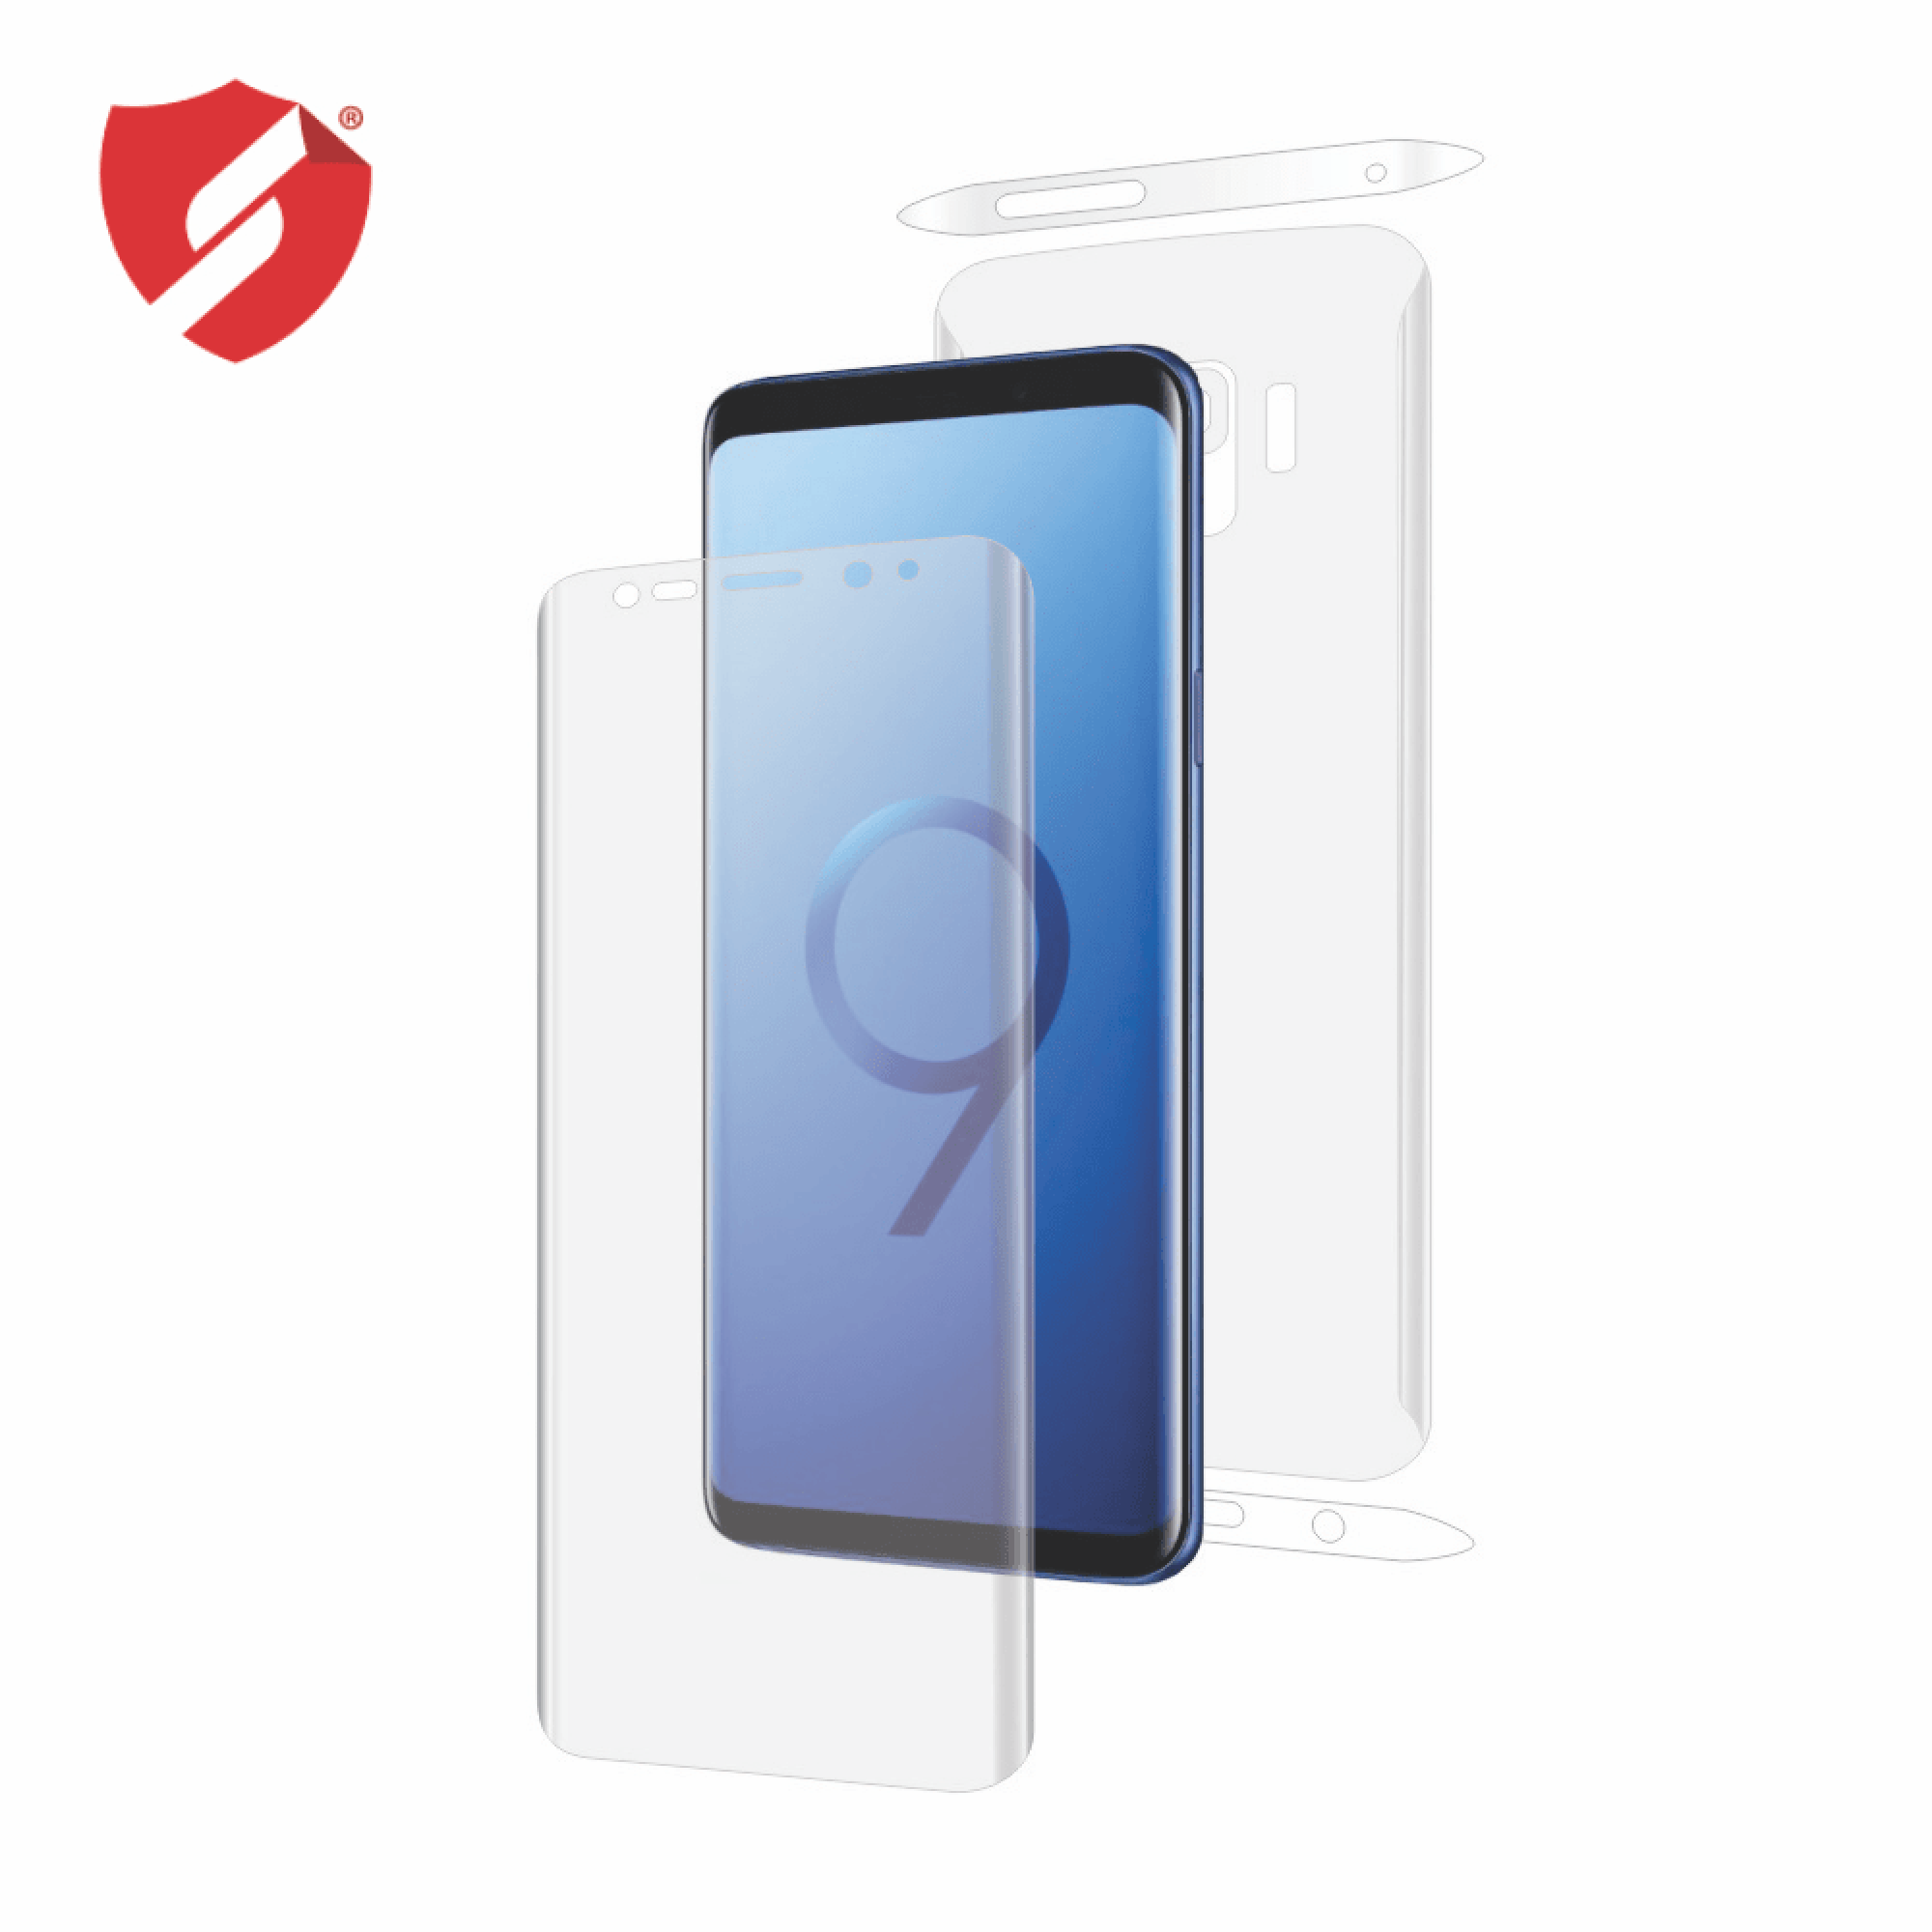 Folie de protectie Smart Protection Samsung Galaxy S9 compatibila cu carcasa Hyperknit - fullbody - display + spate + laterale imagine